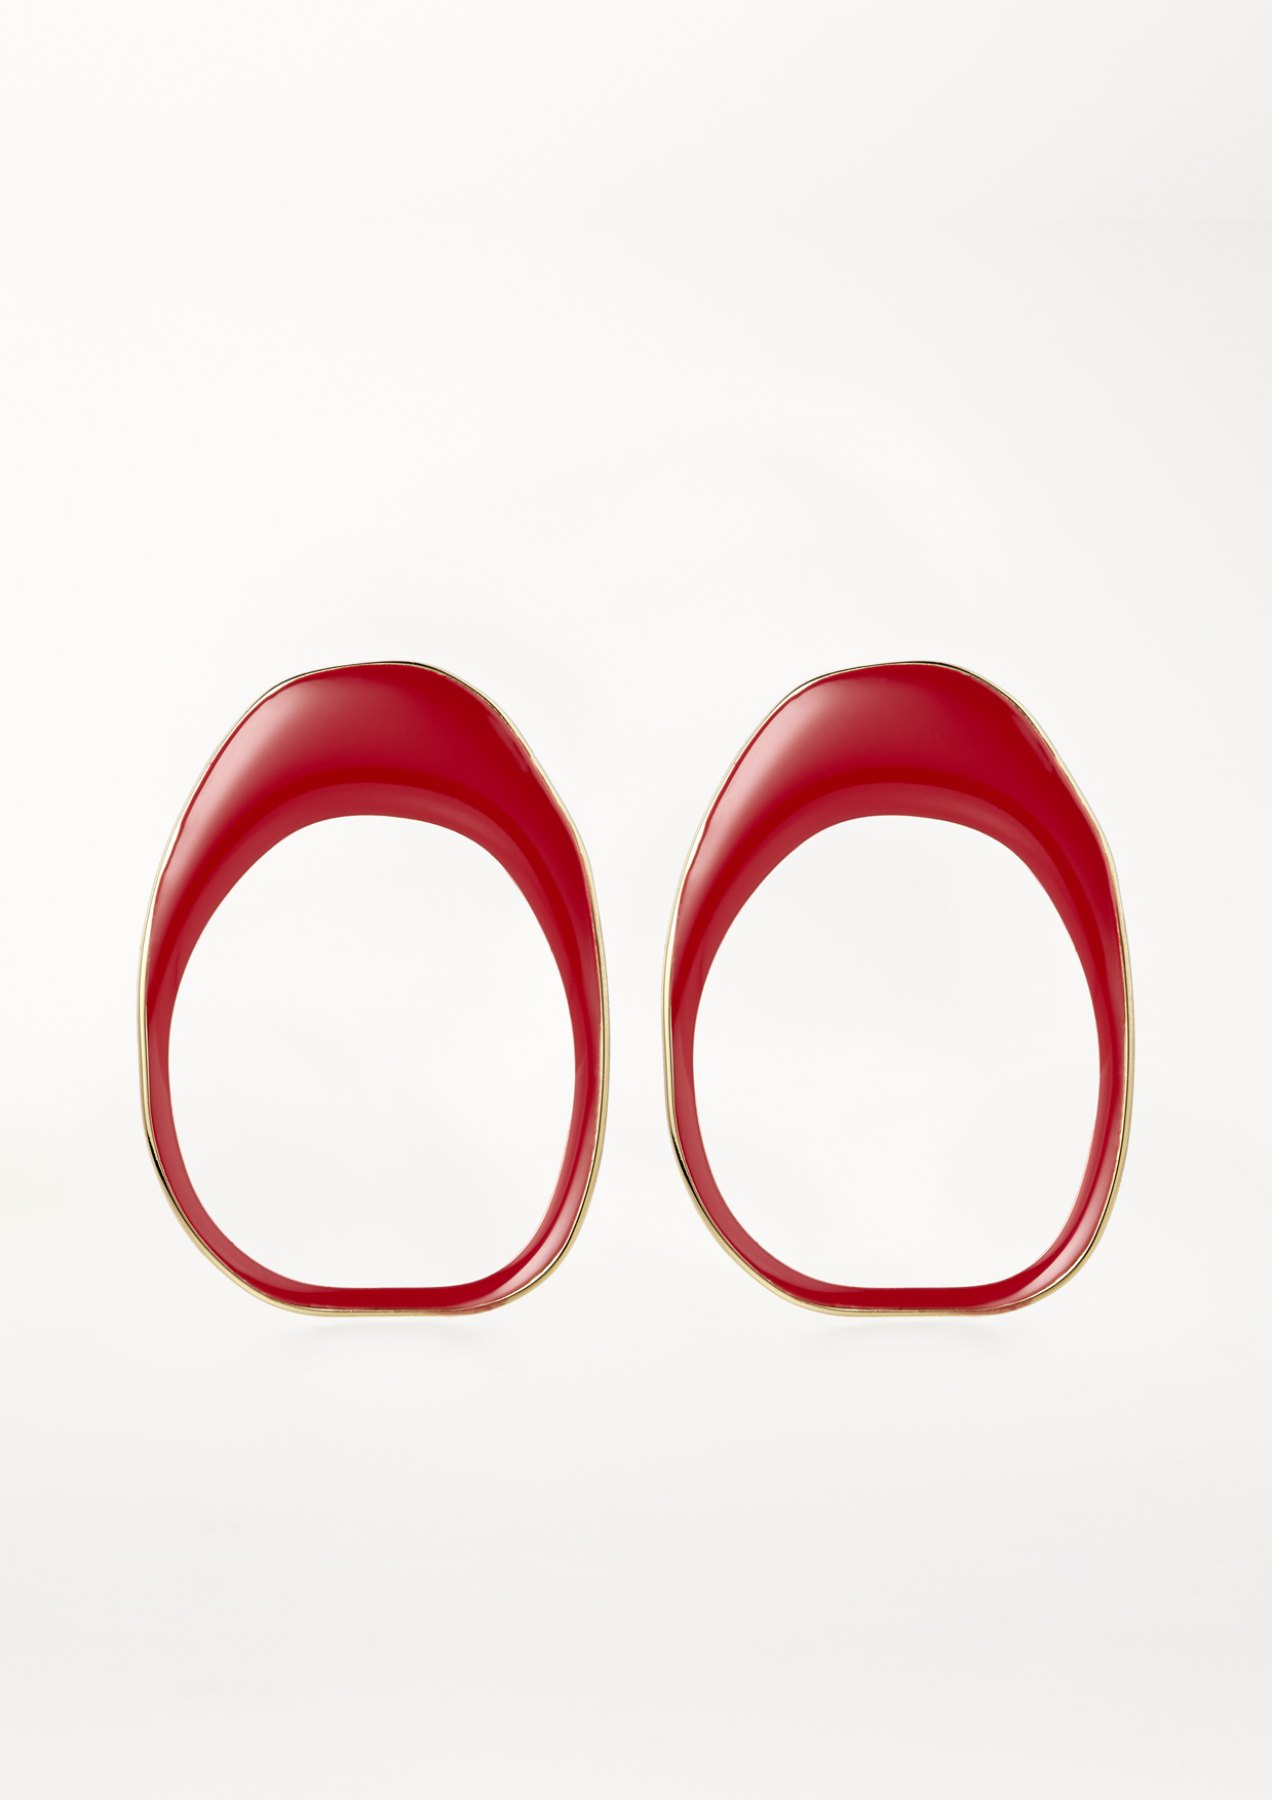 xenia bous jewellery coloured stone 02 earrings feuerrot red